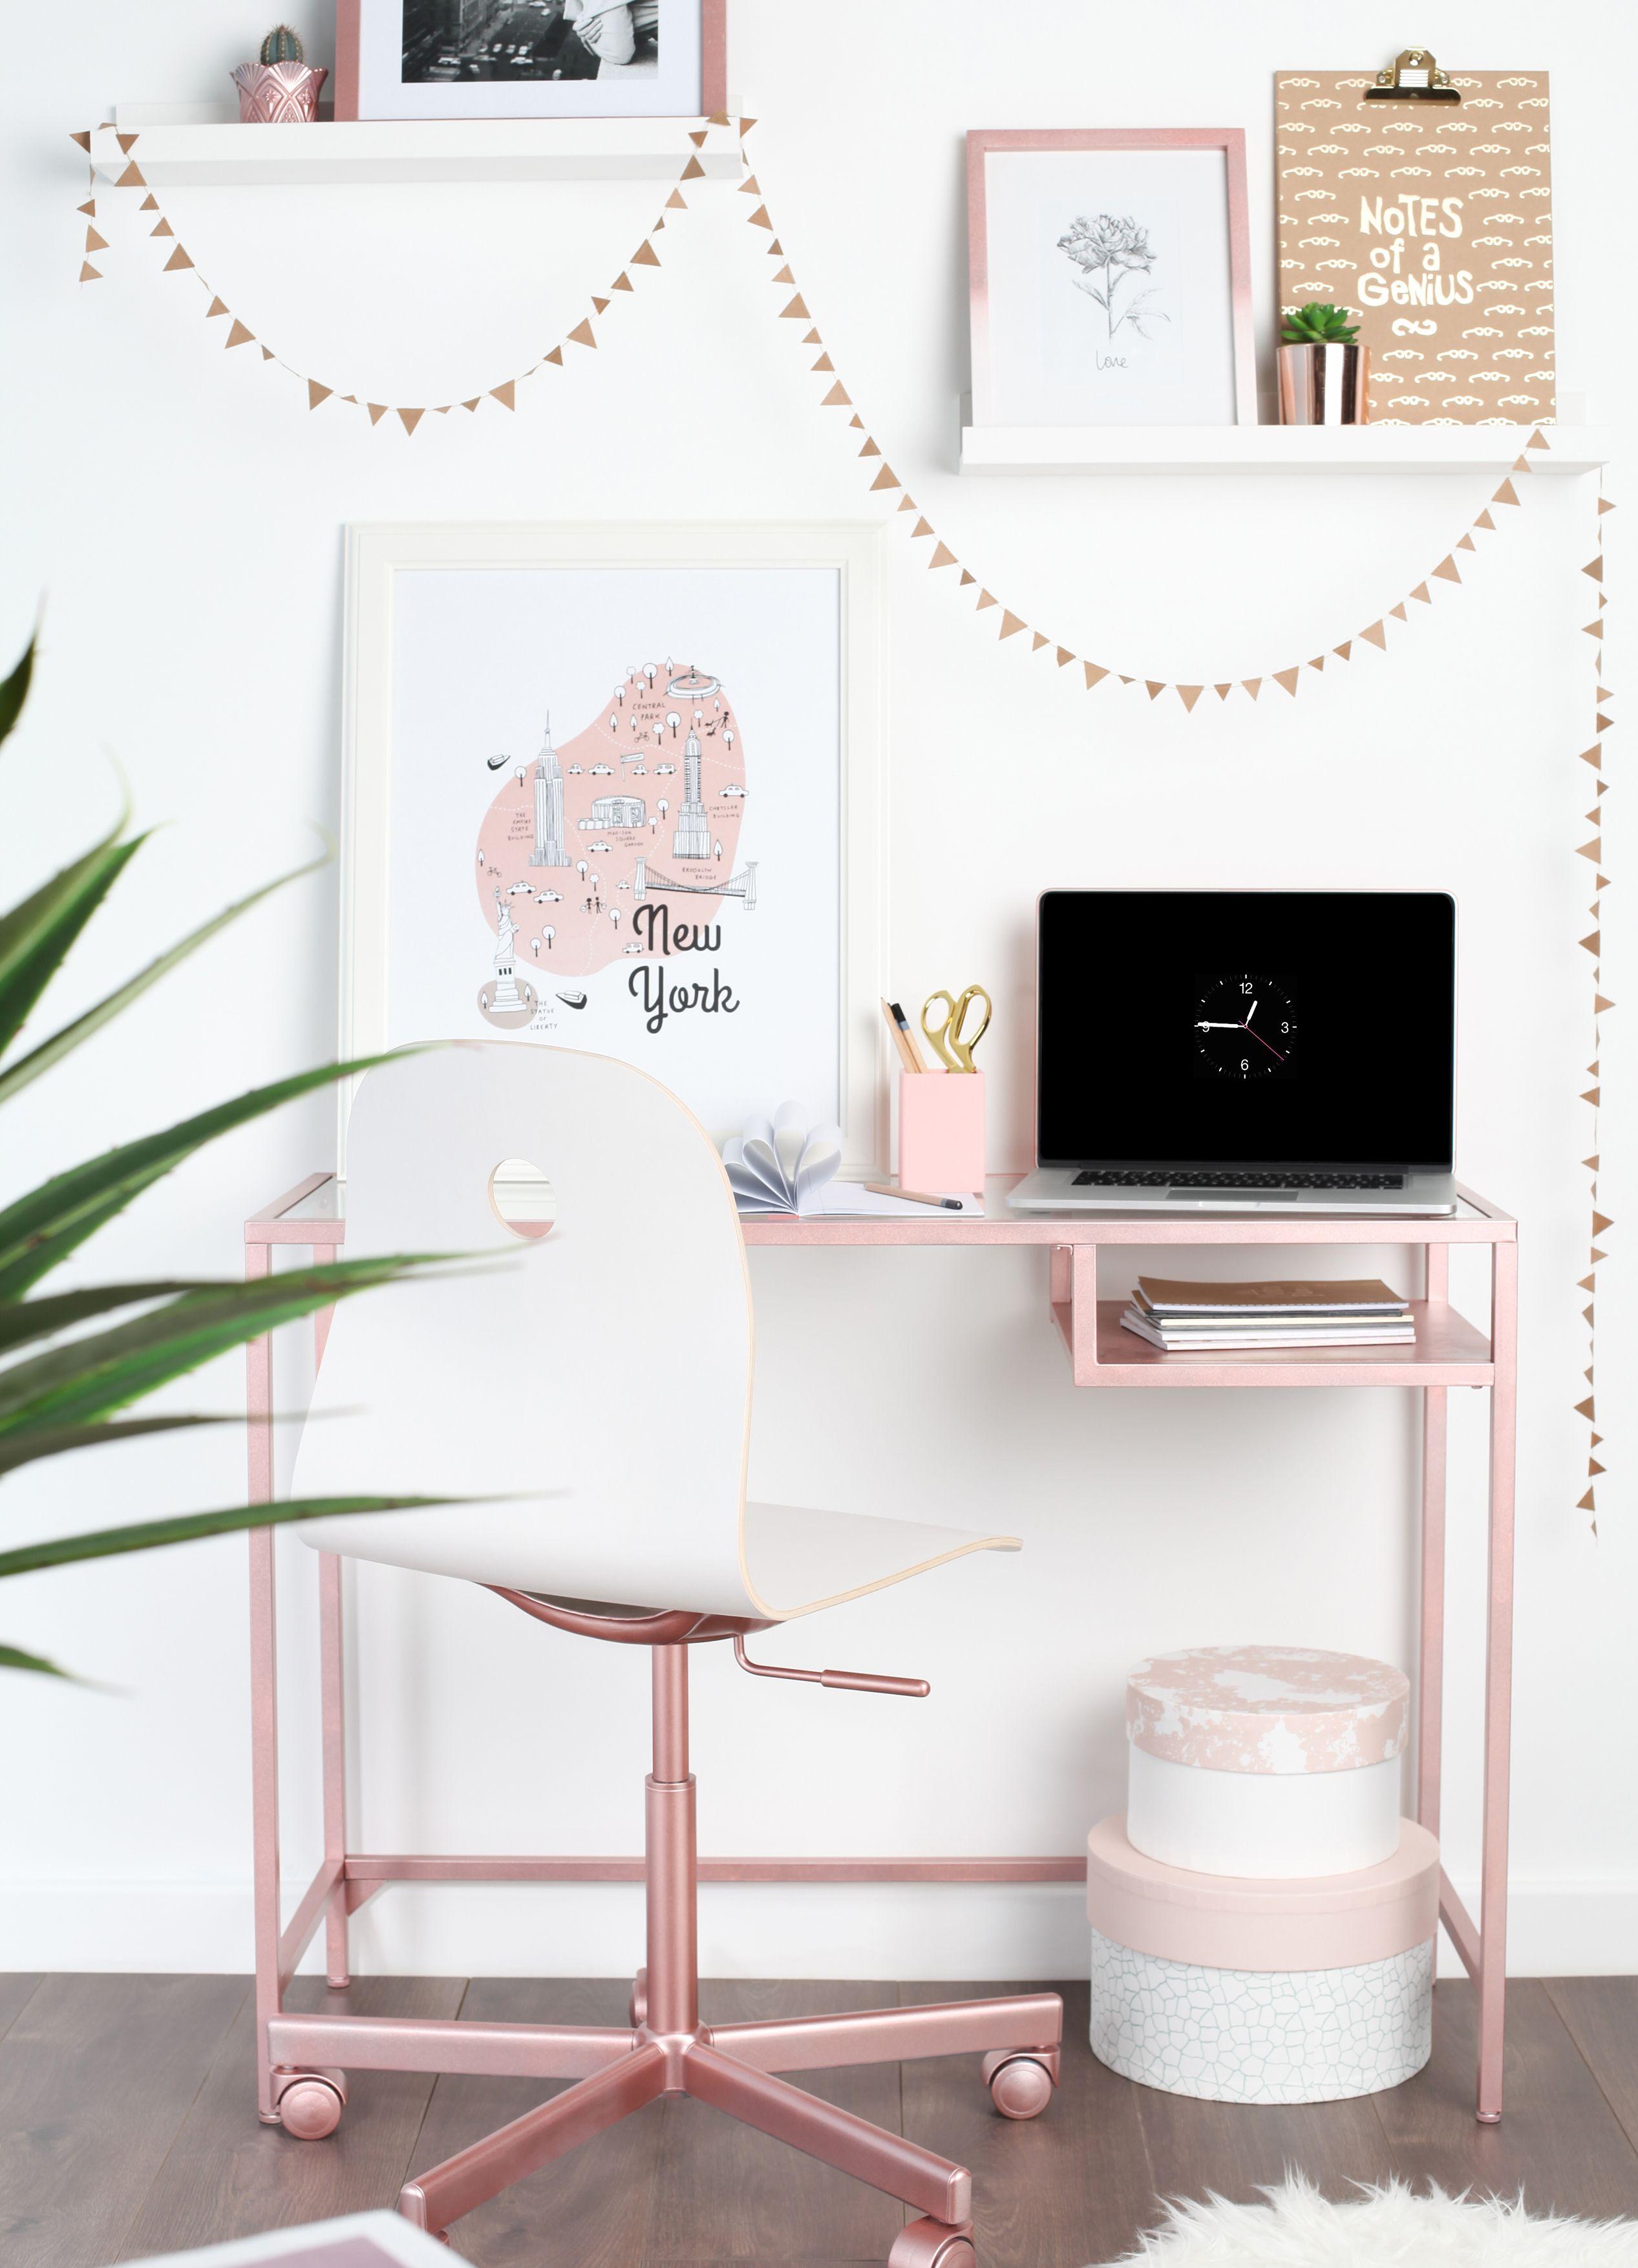 Ikea Hack  VITTSJÖ Laptop Table/ Desk Sprayed With Rose Gold Spray Paint  From Rust